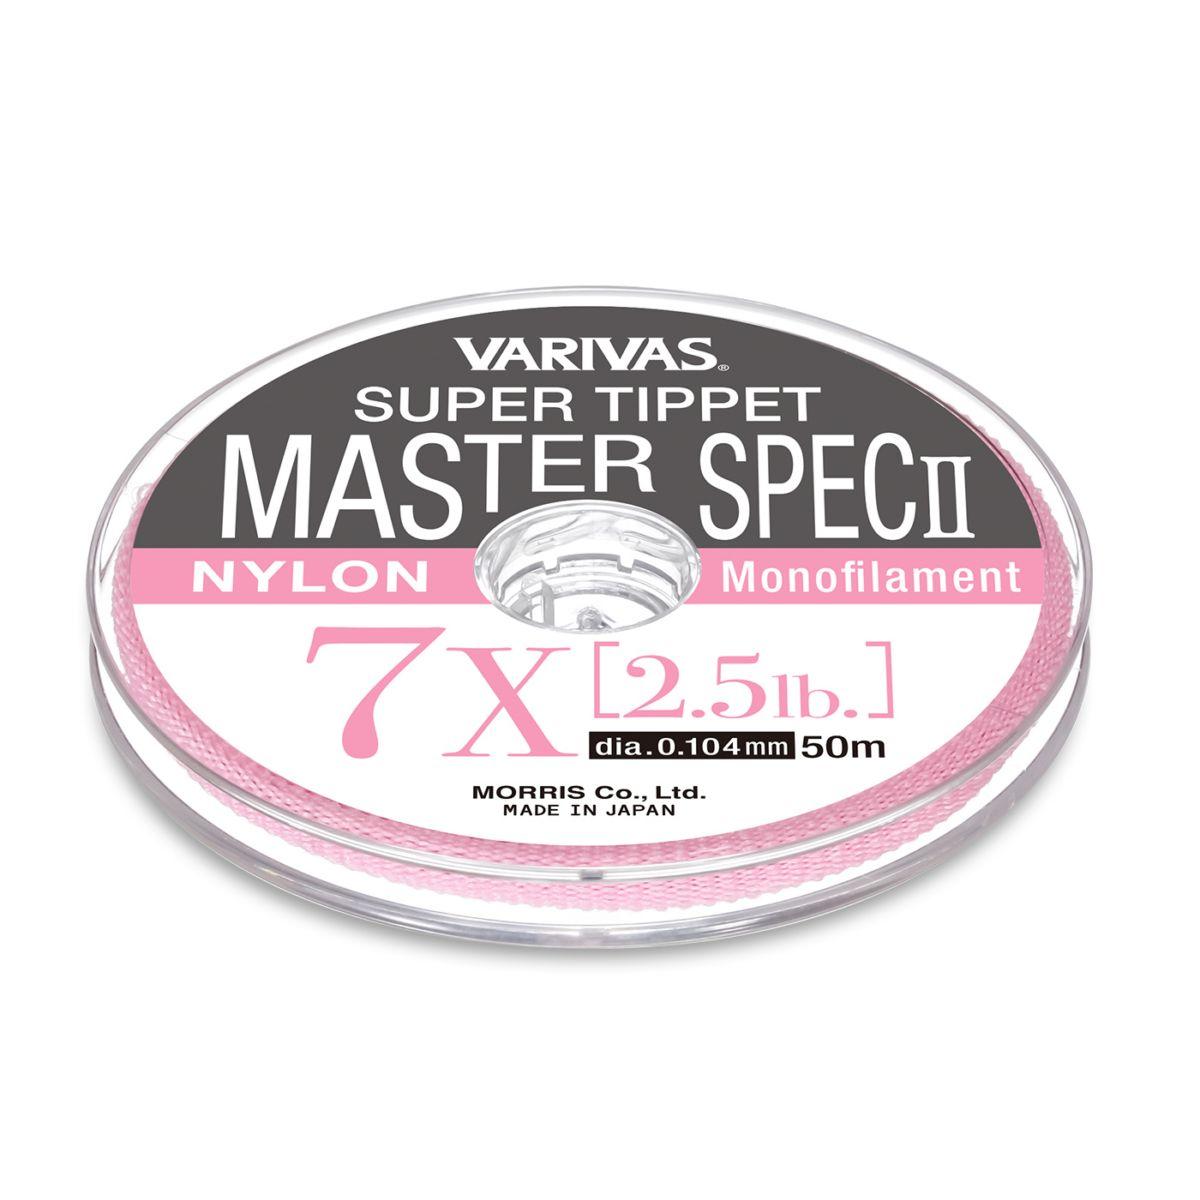 VARIVAS MASTER SPEC II SUPER TIPPET NYLON